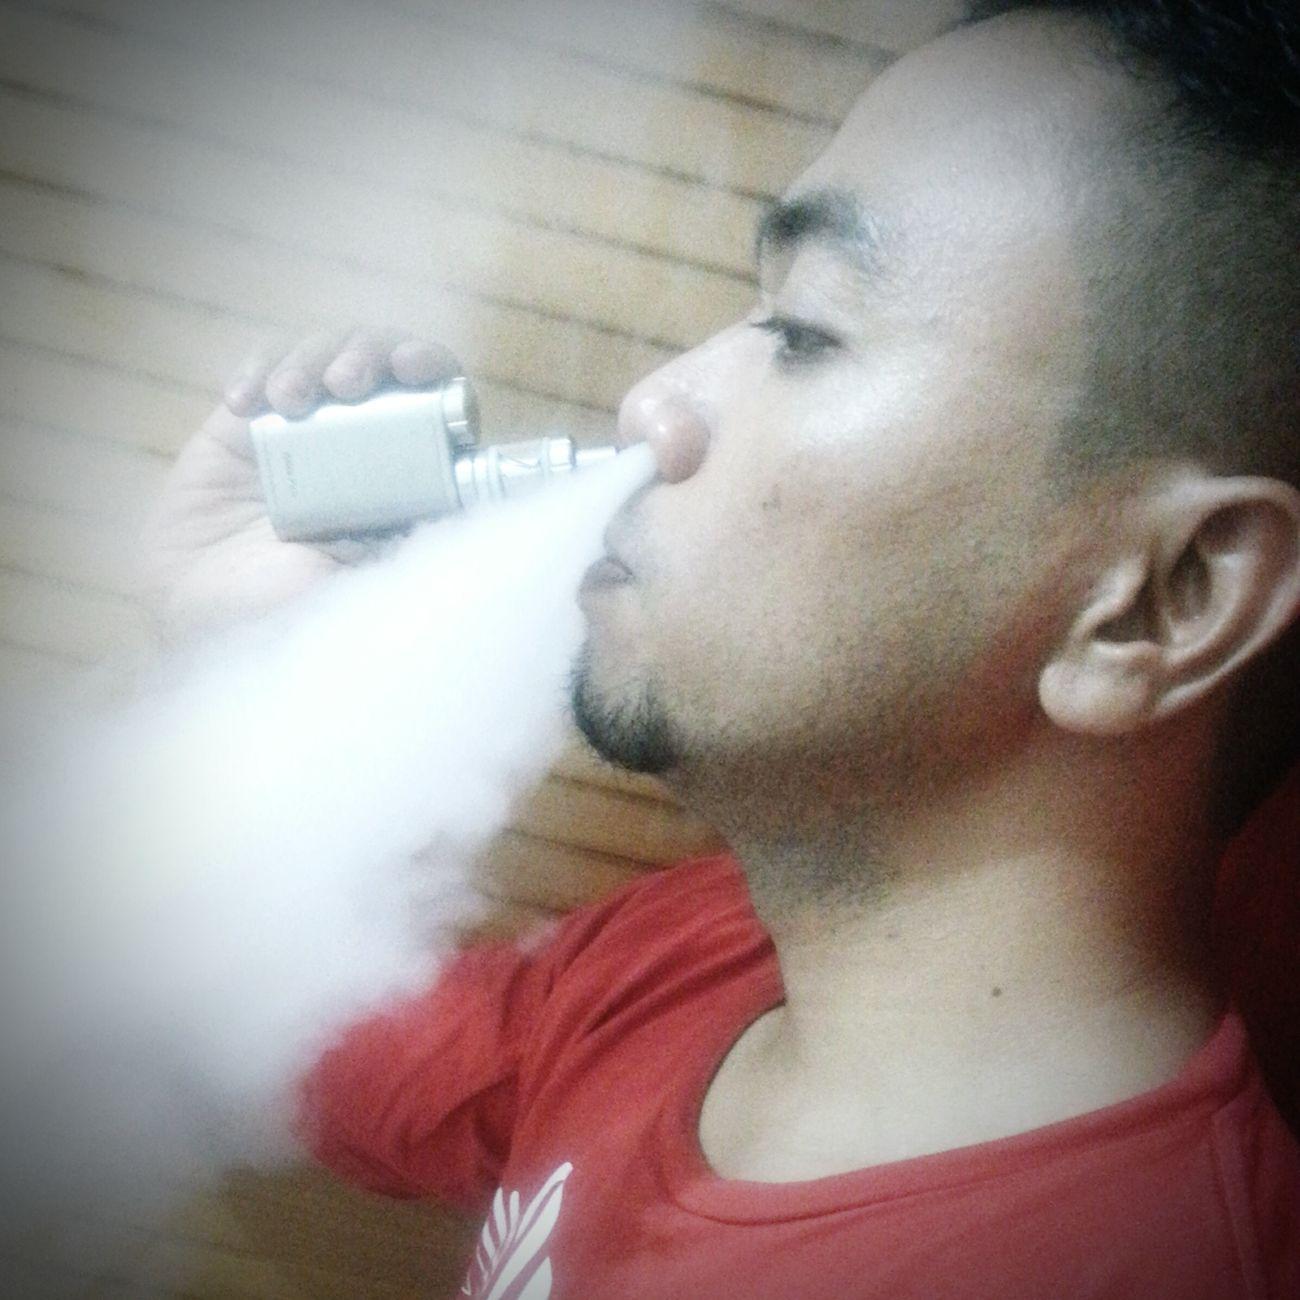 Electric Cigarette Lovehusband Lifestyles Vapecommunity Vaper Vapesociety